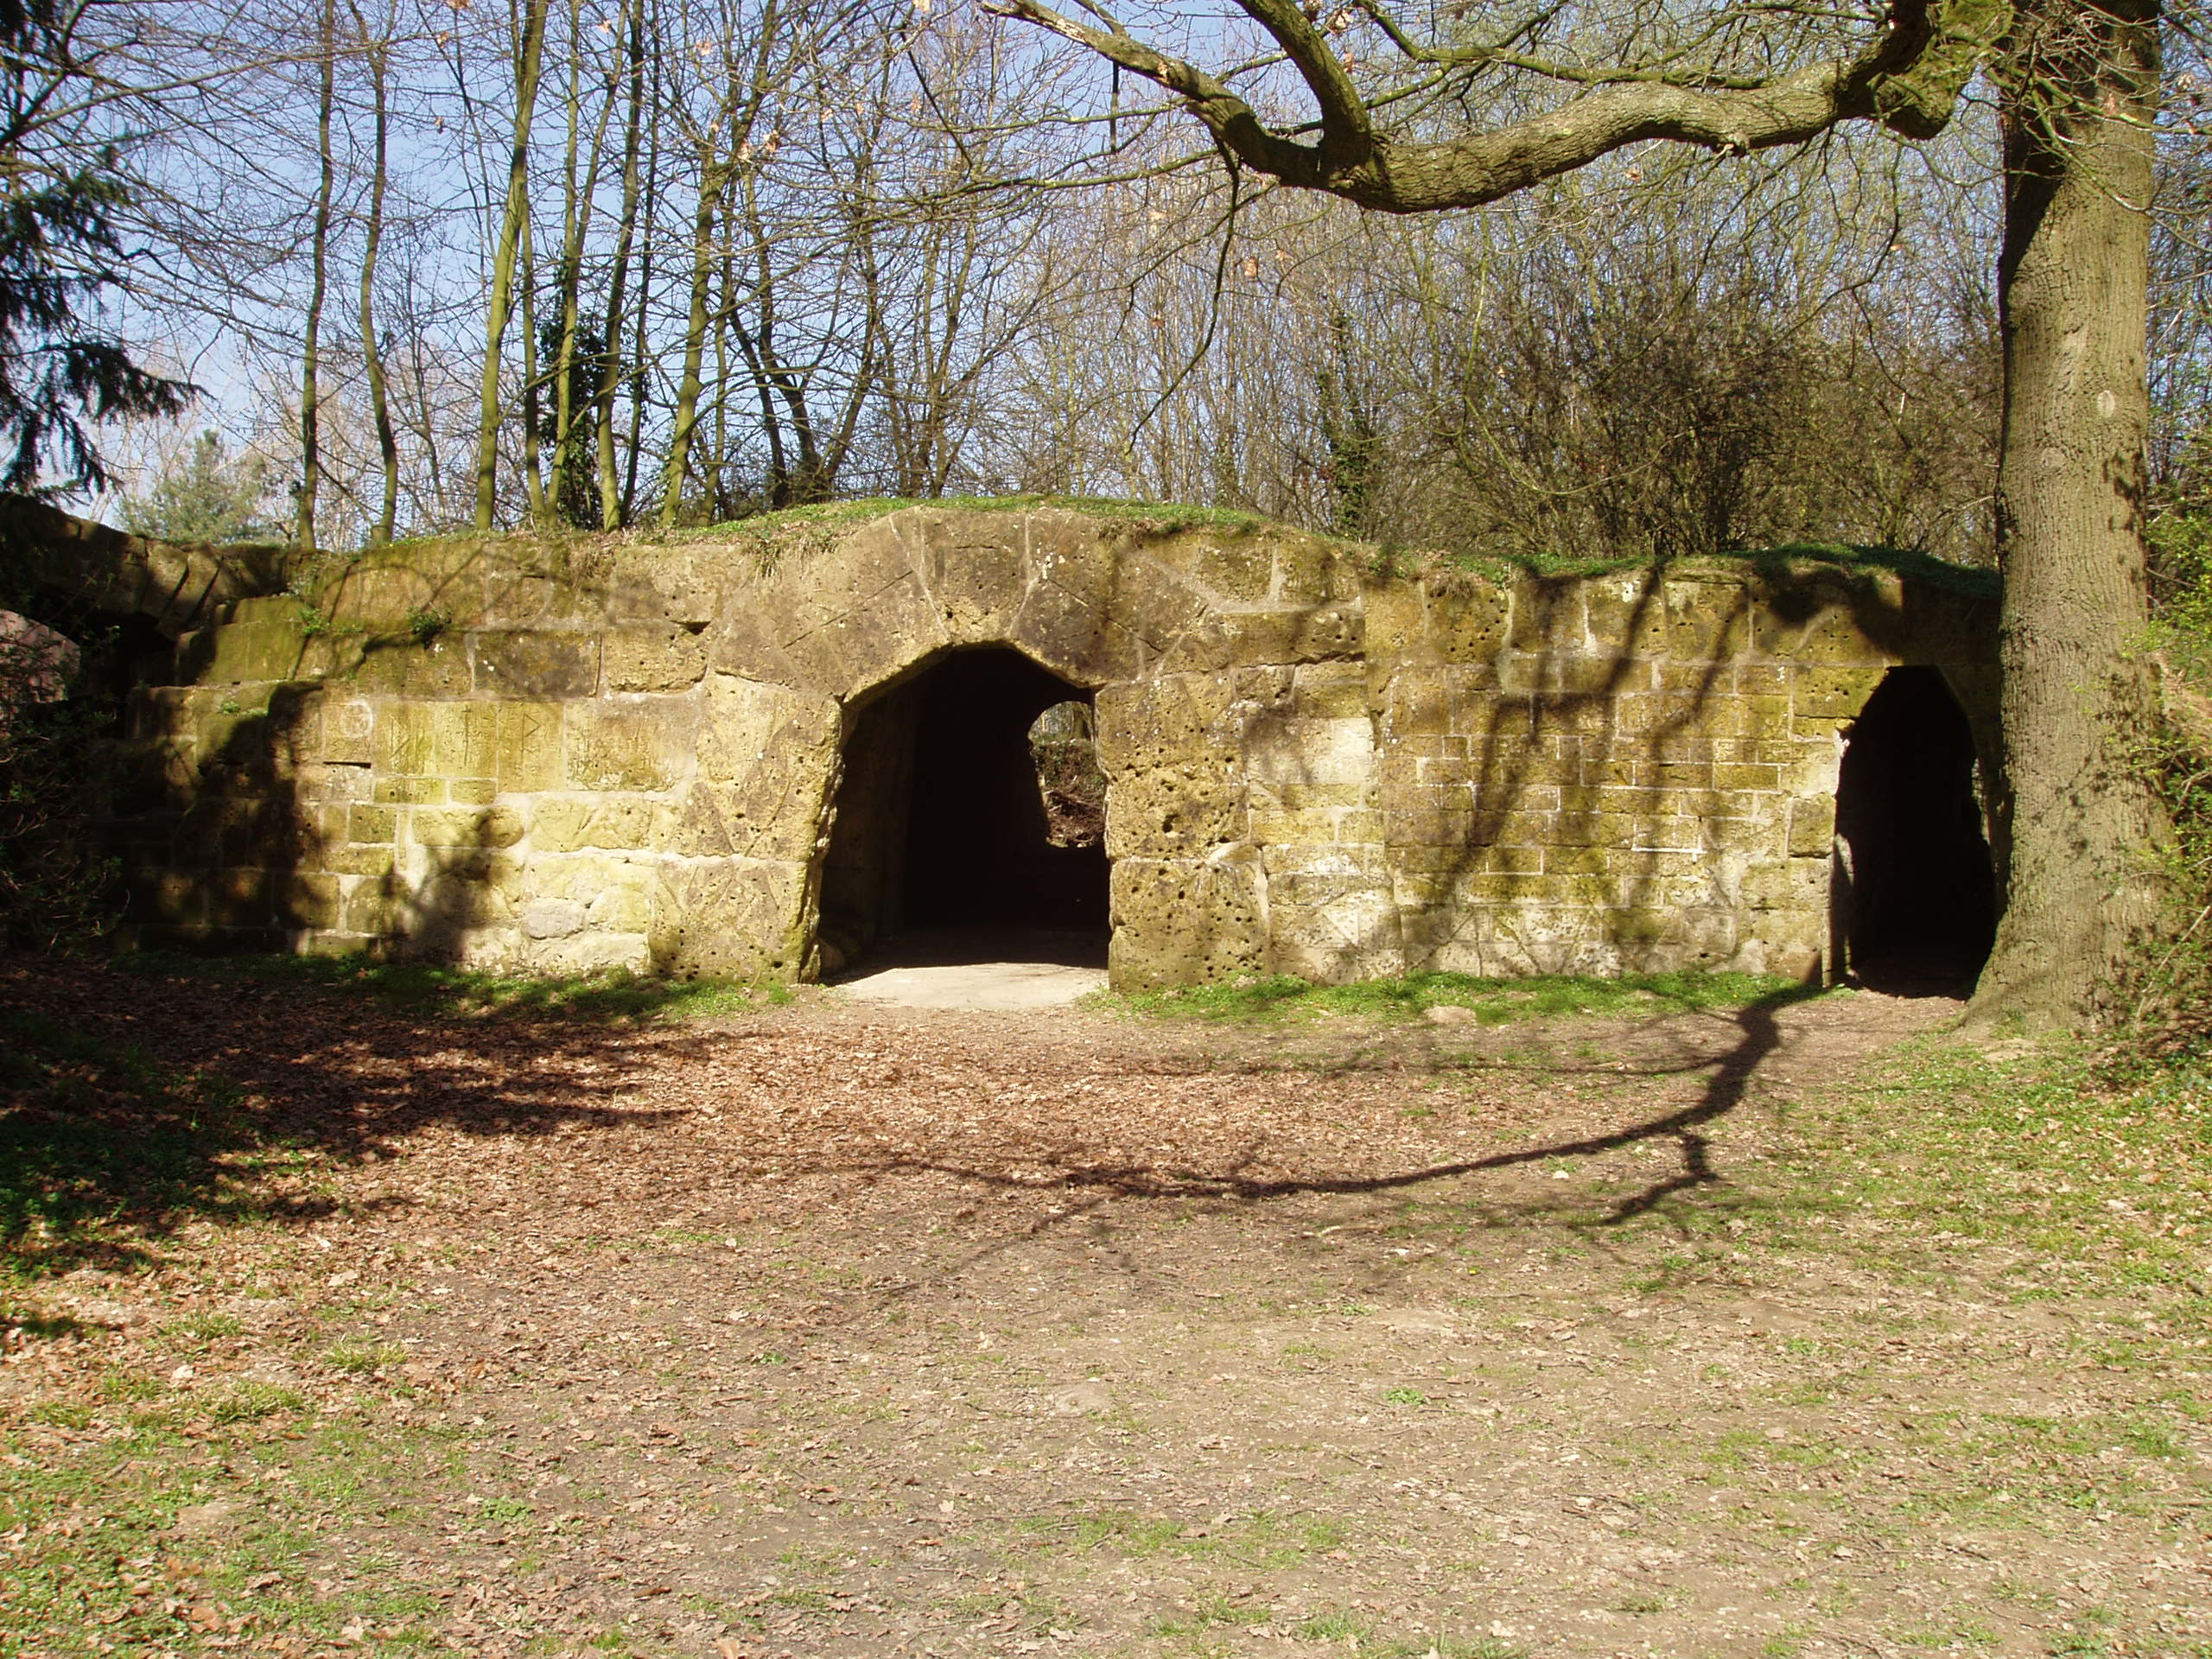 Kasteel amstenrade grot in amstenrade monument - Grot ontwerp ...